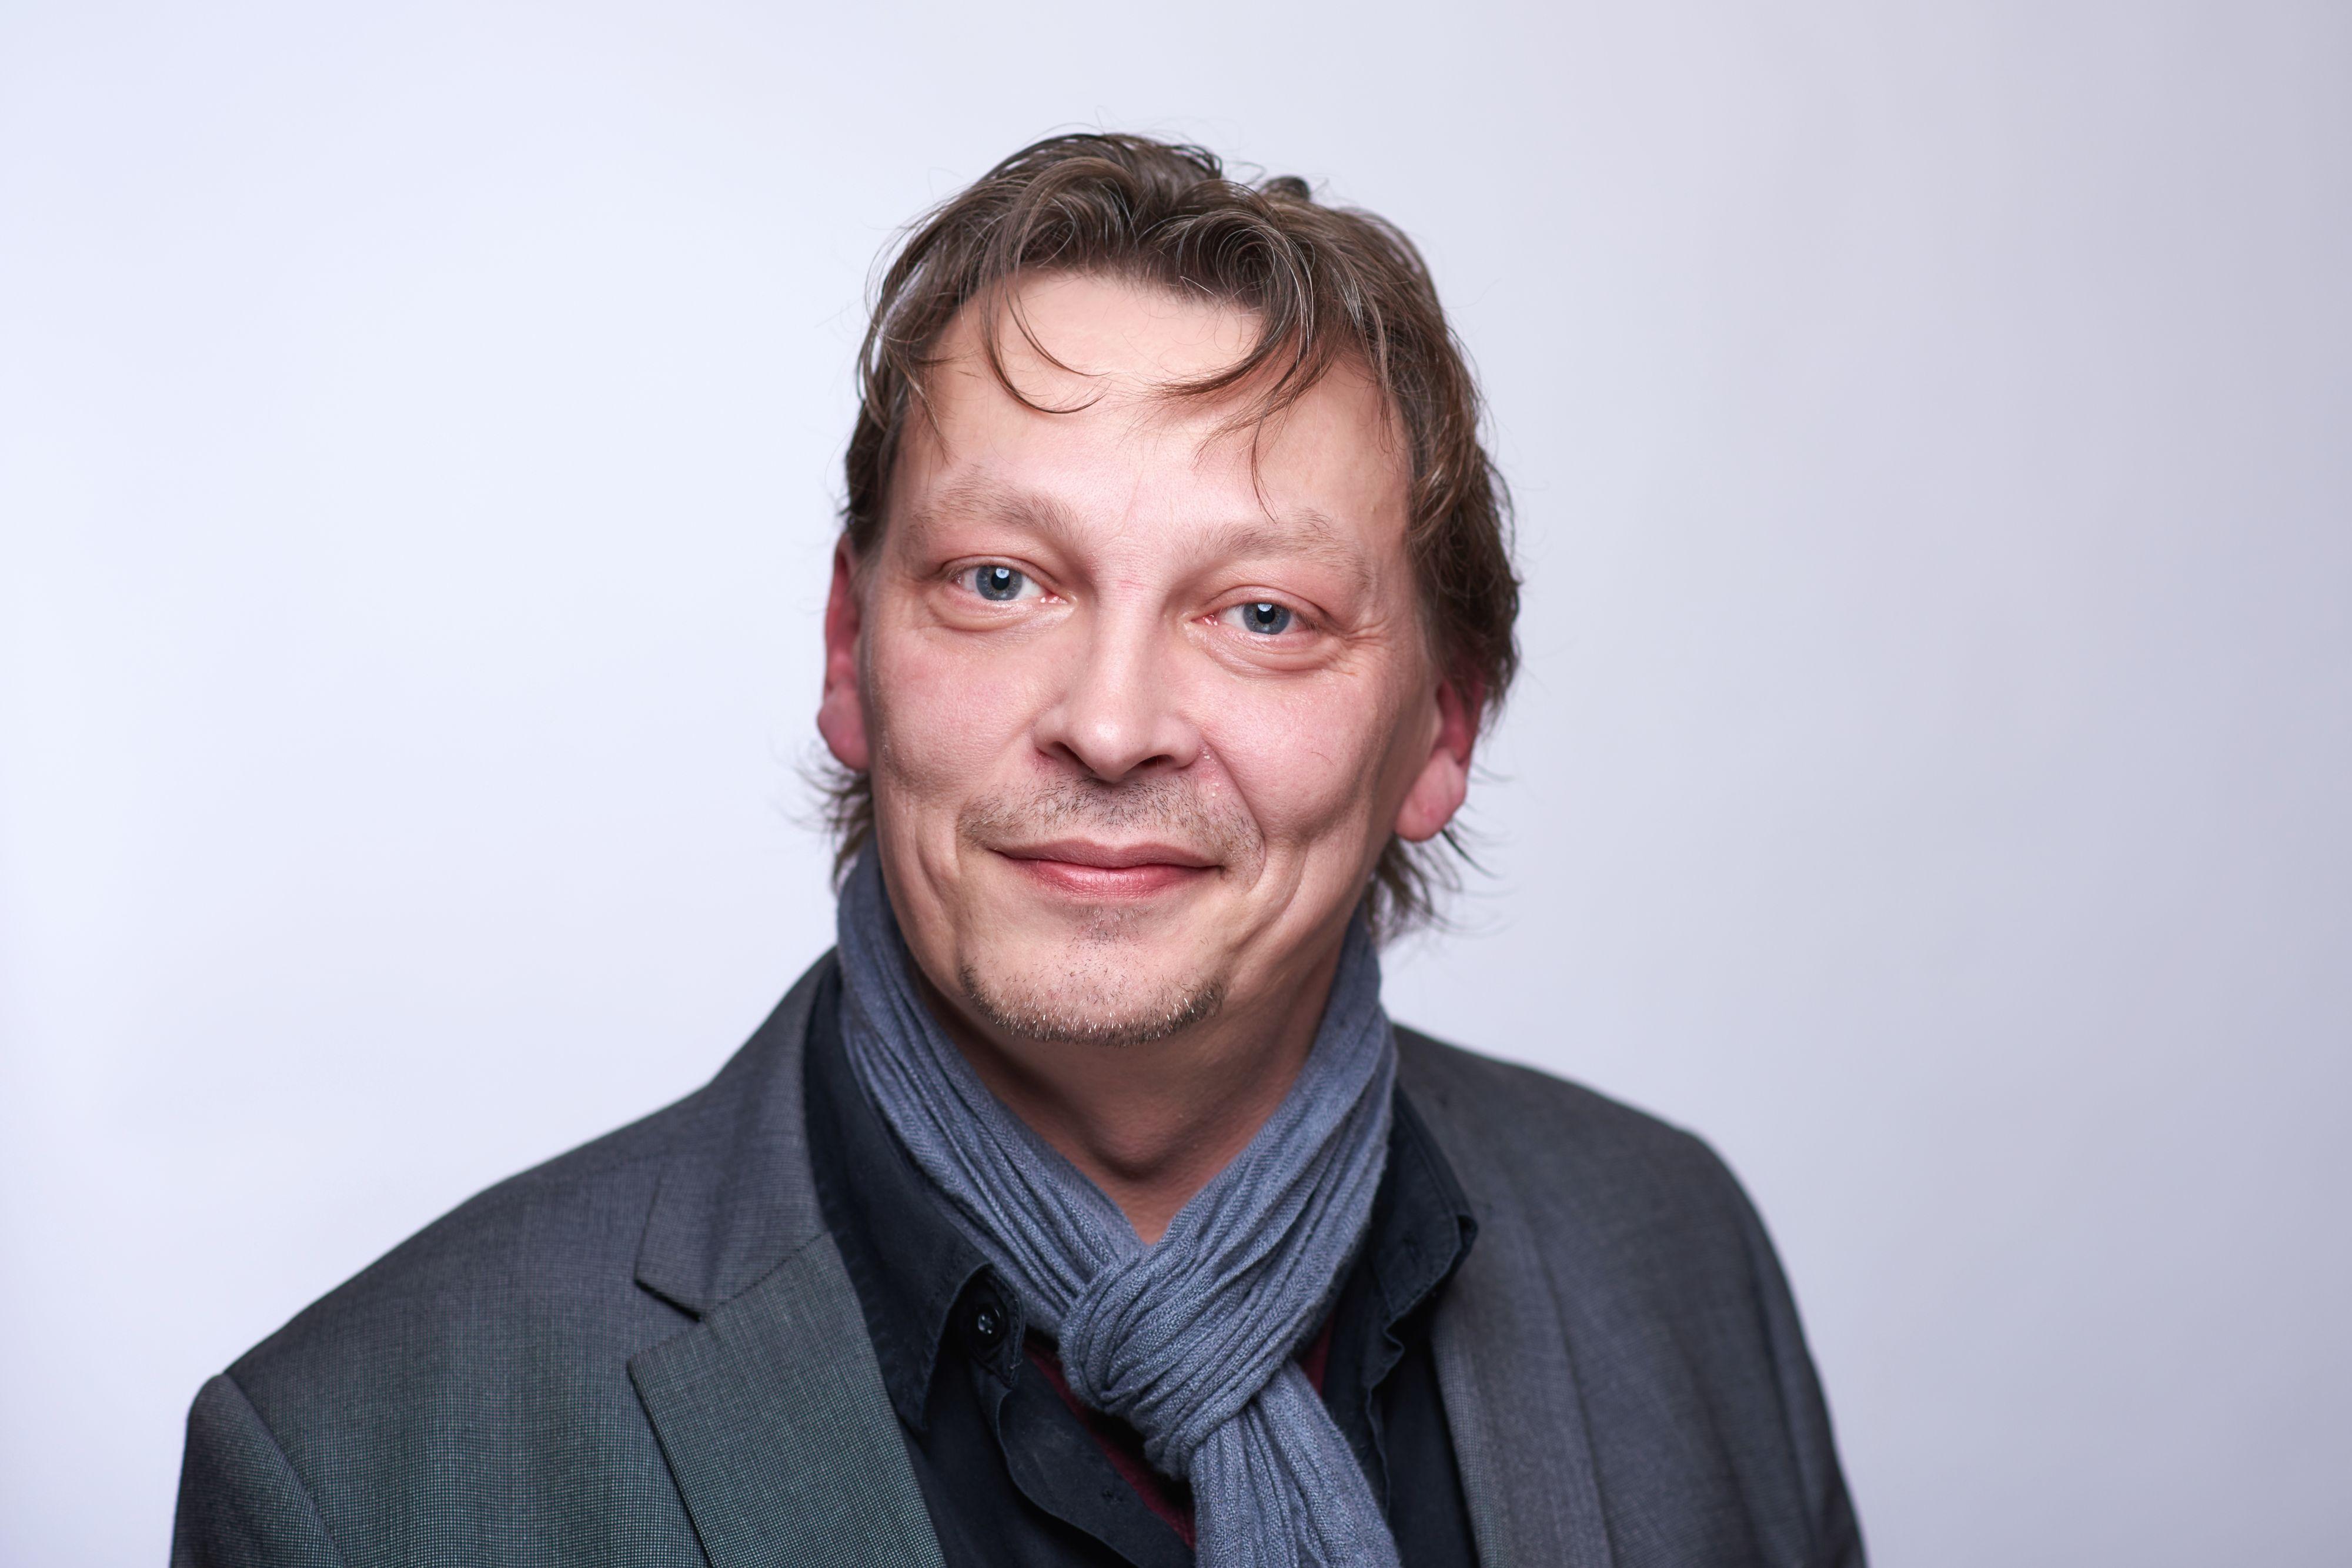 Stefan Hucklenbroich